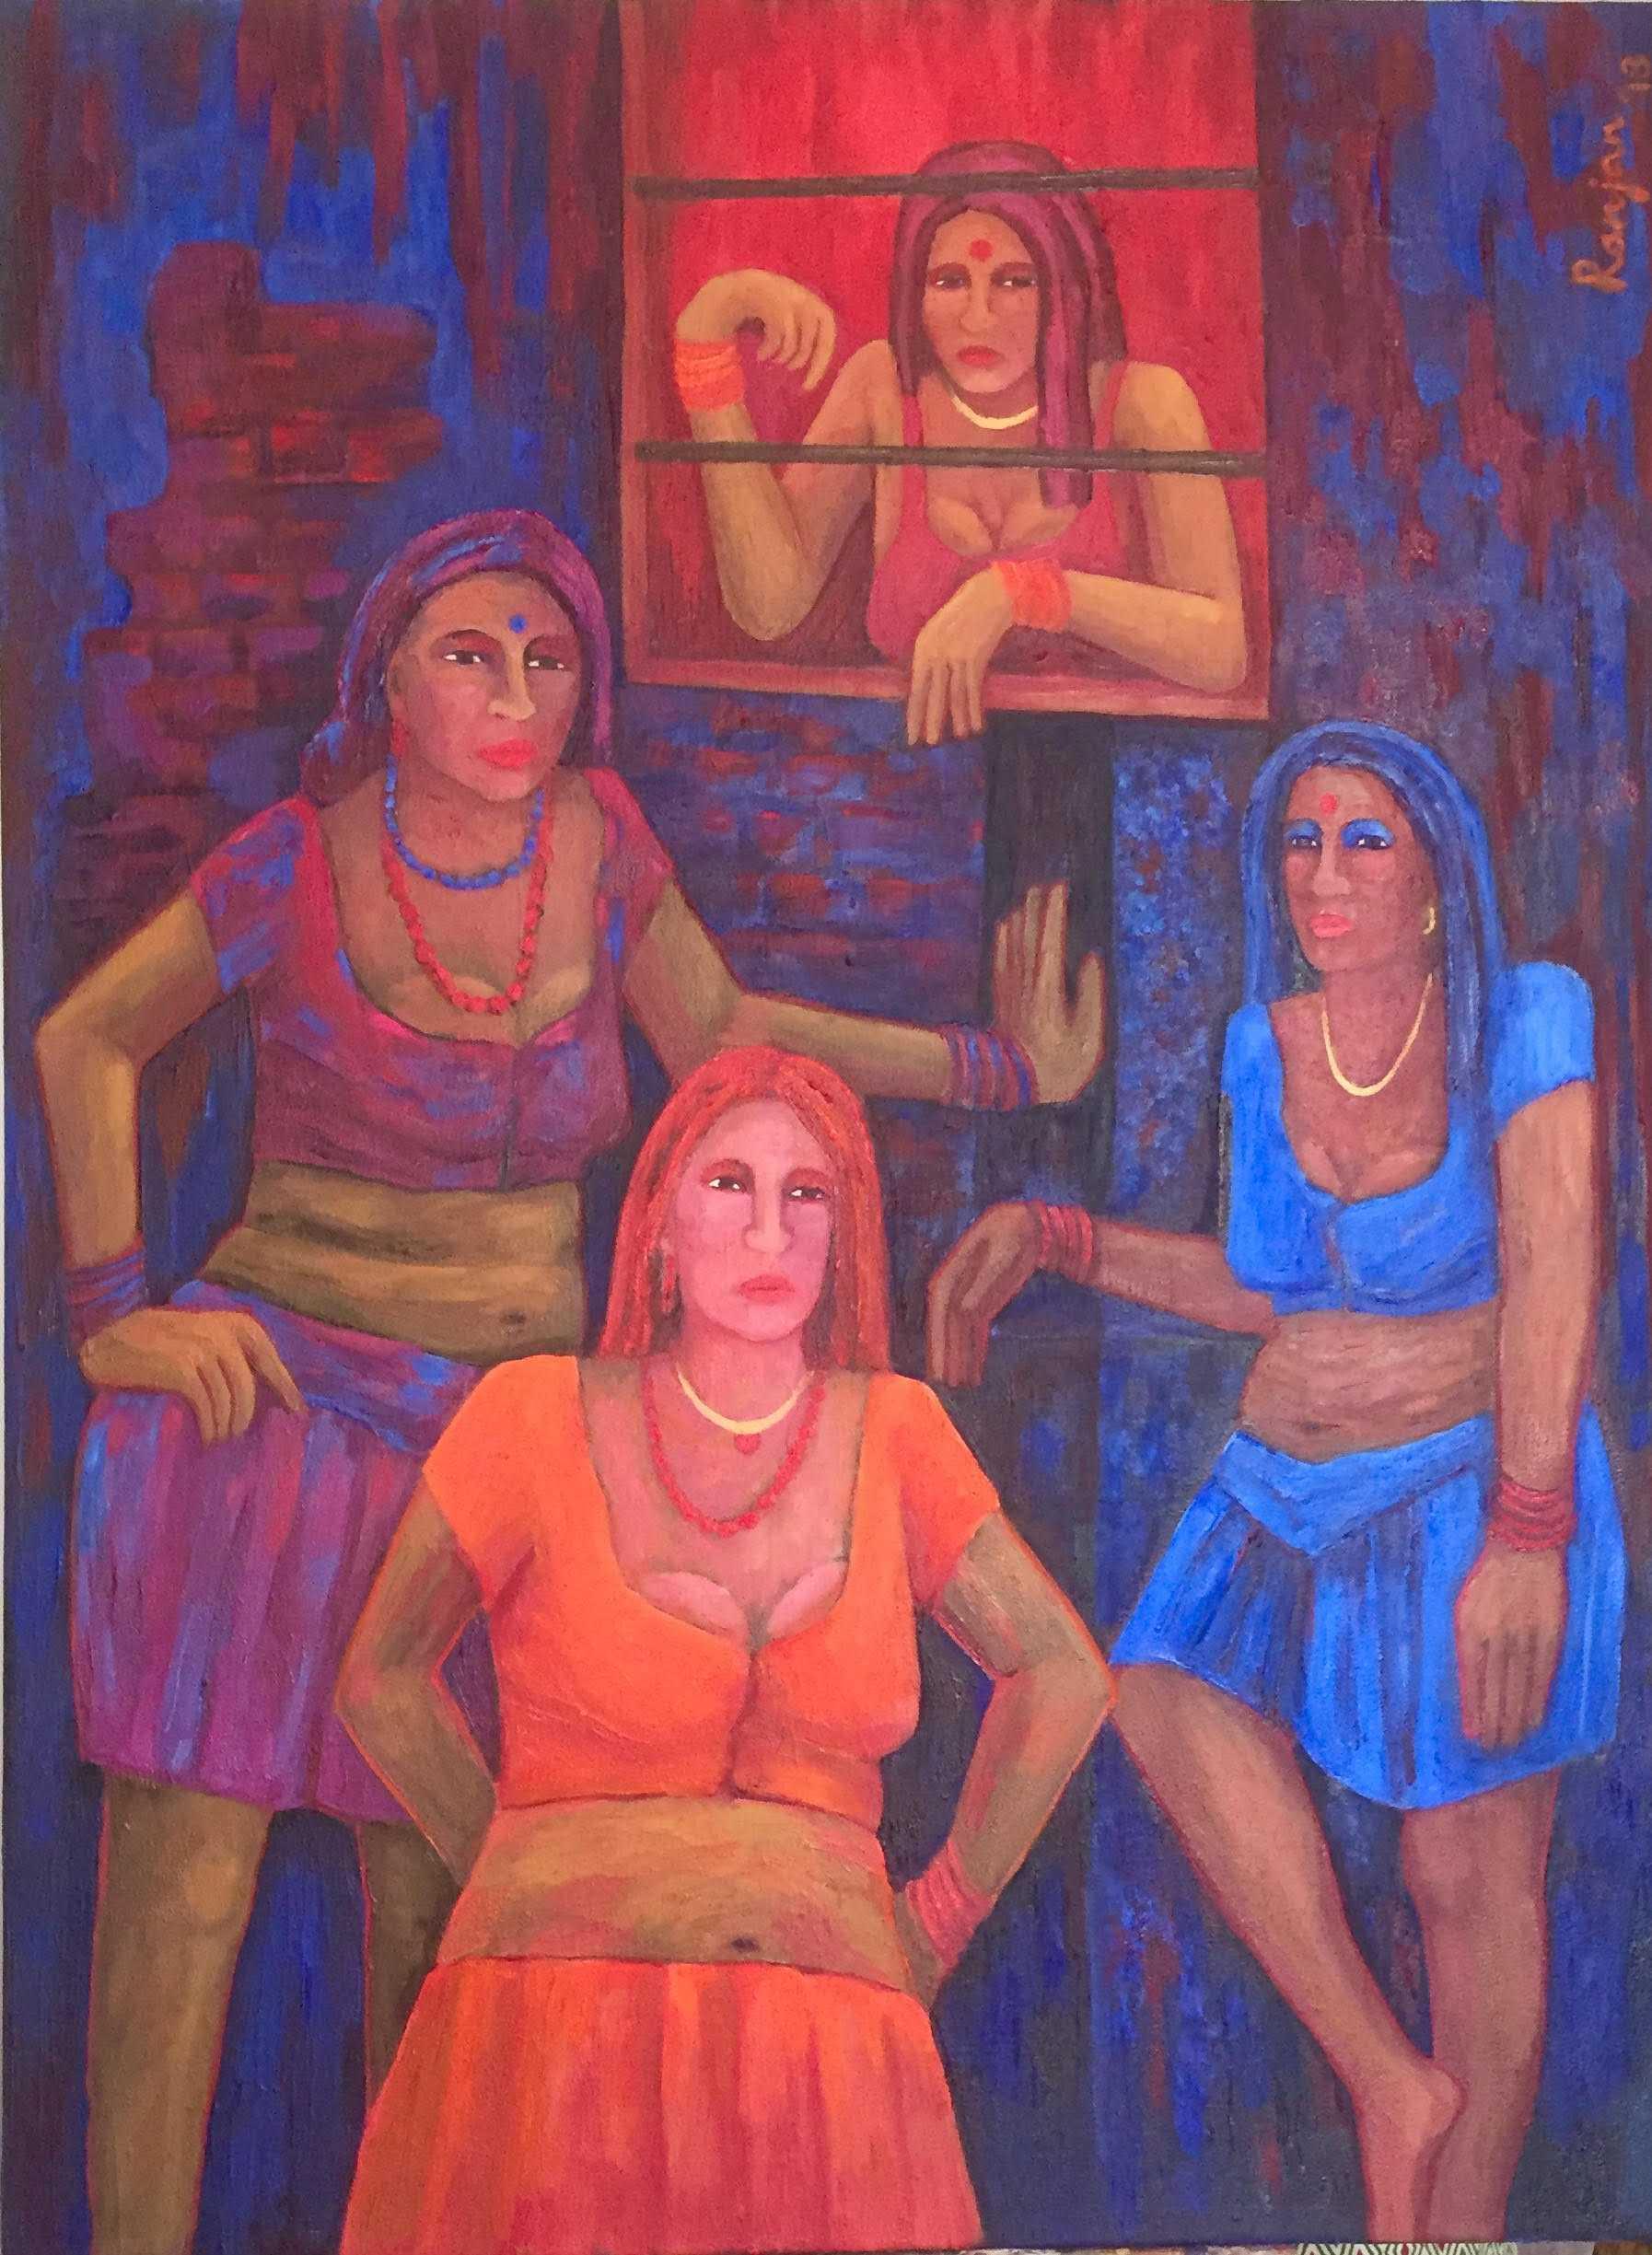 Ladies in waiting-ranjan kaul- fnbworld